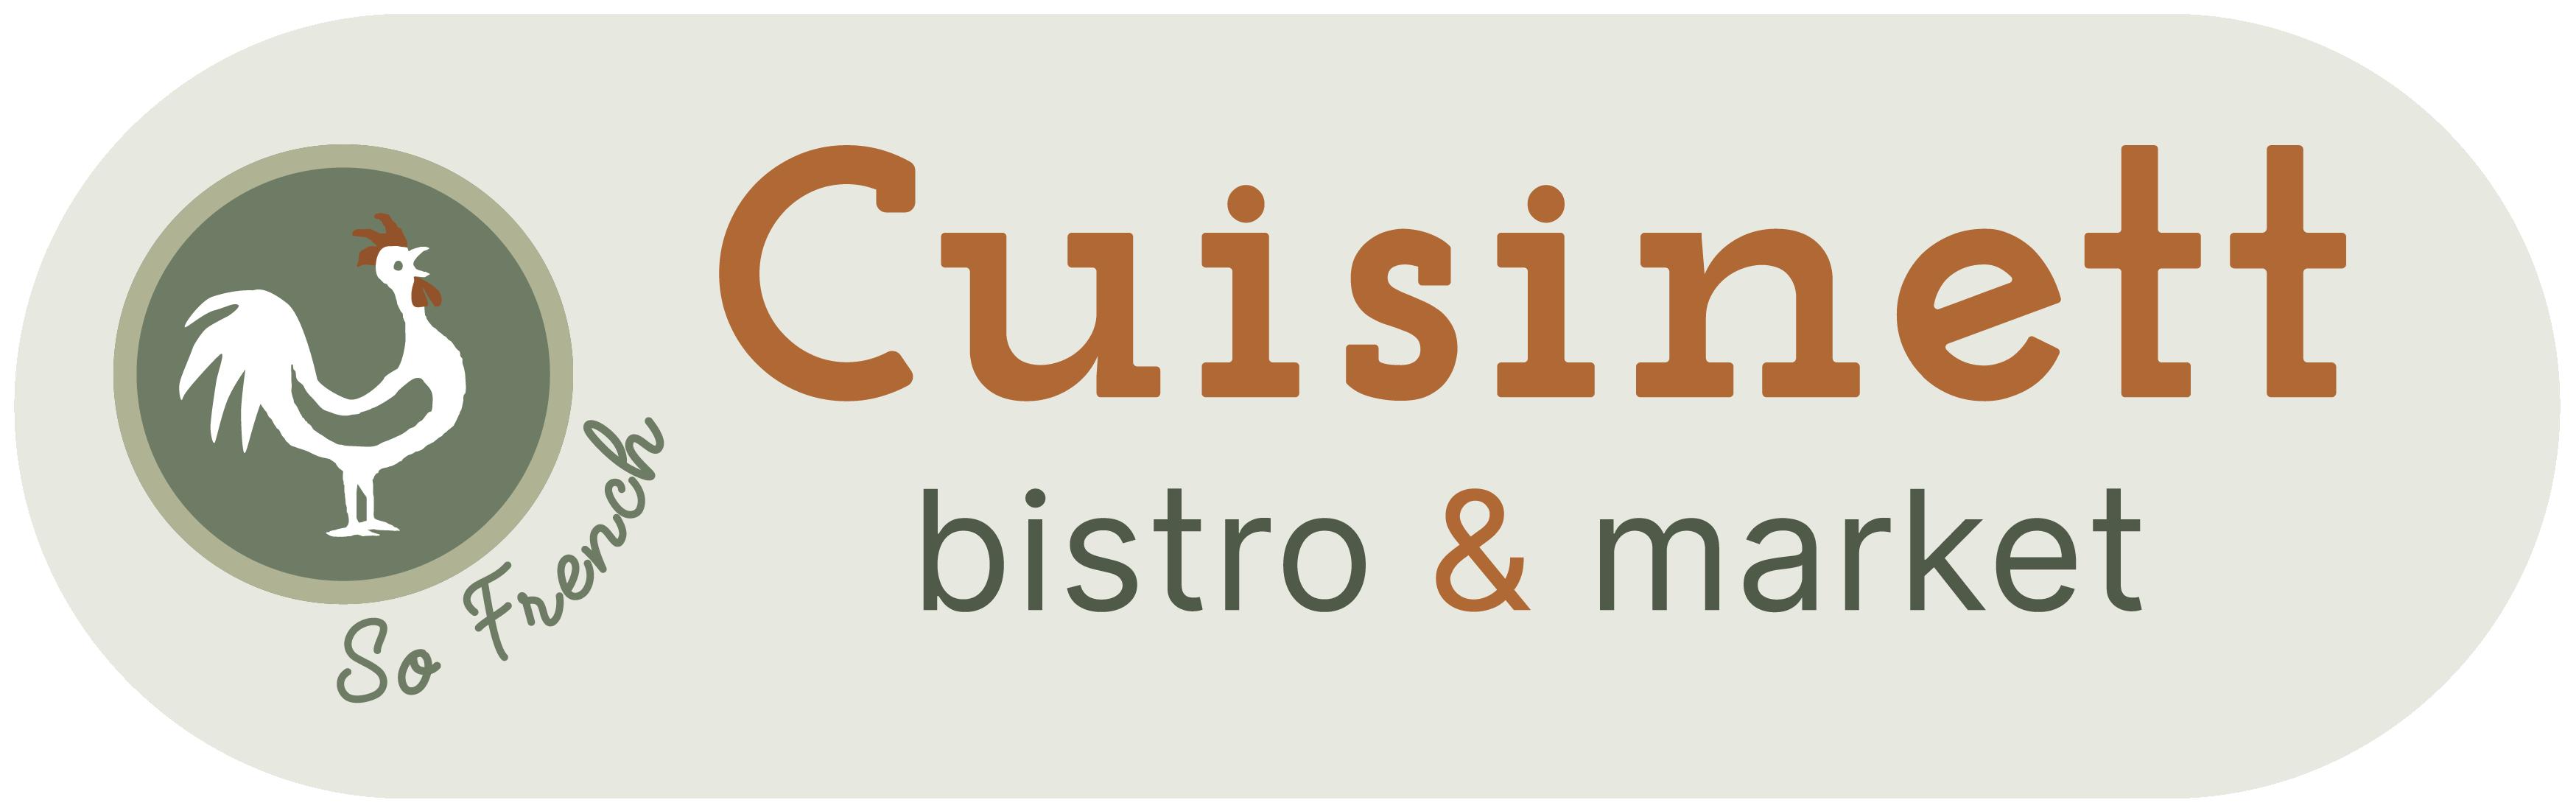 Cuisinett French Comfort Food Home